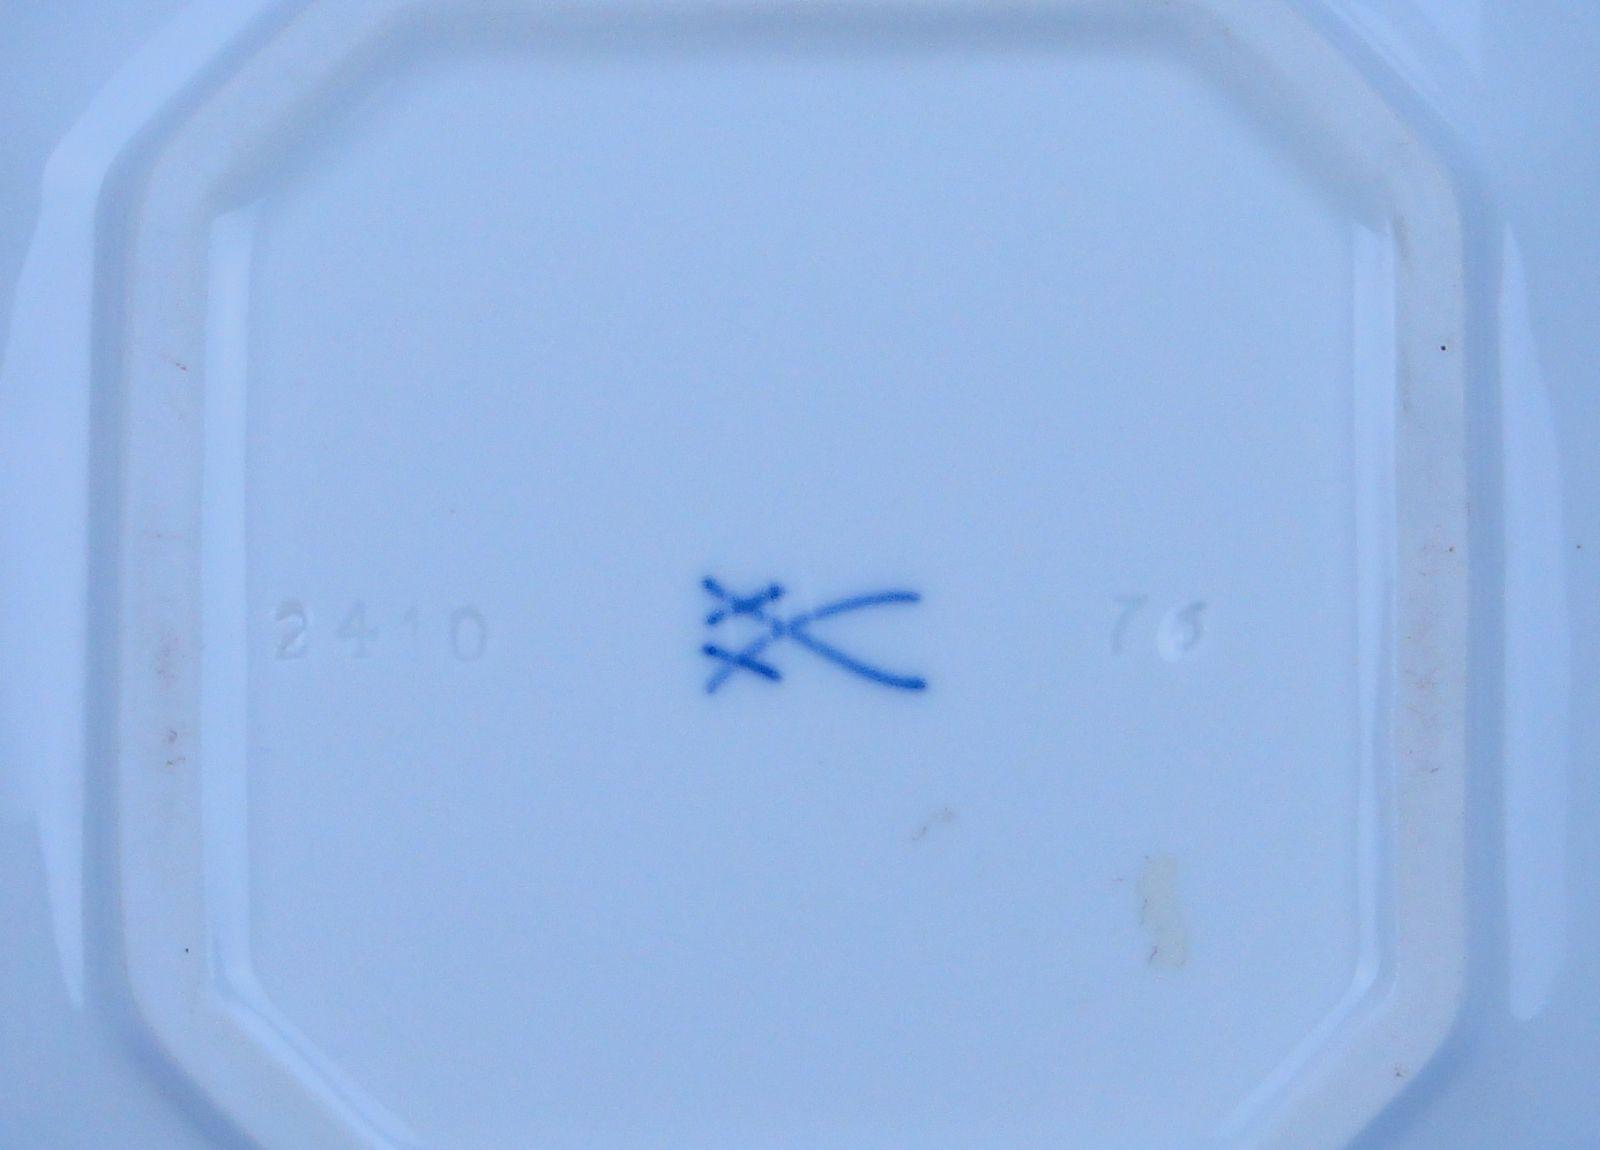 DSC04974.JPG (1600×1150)